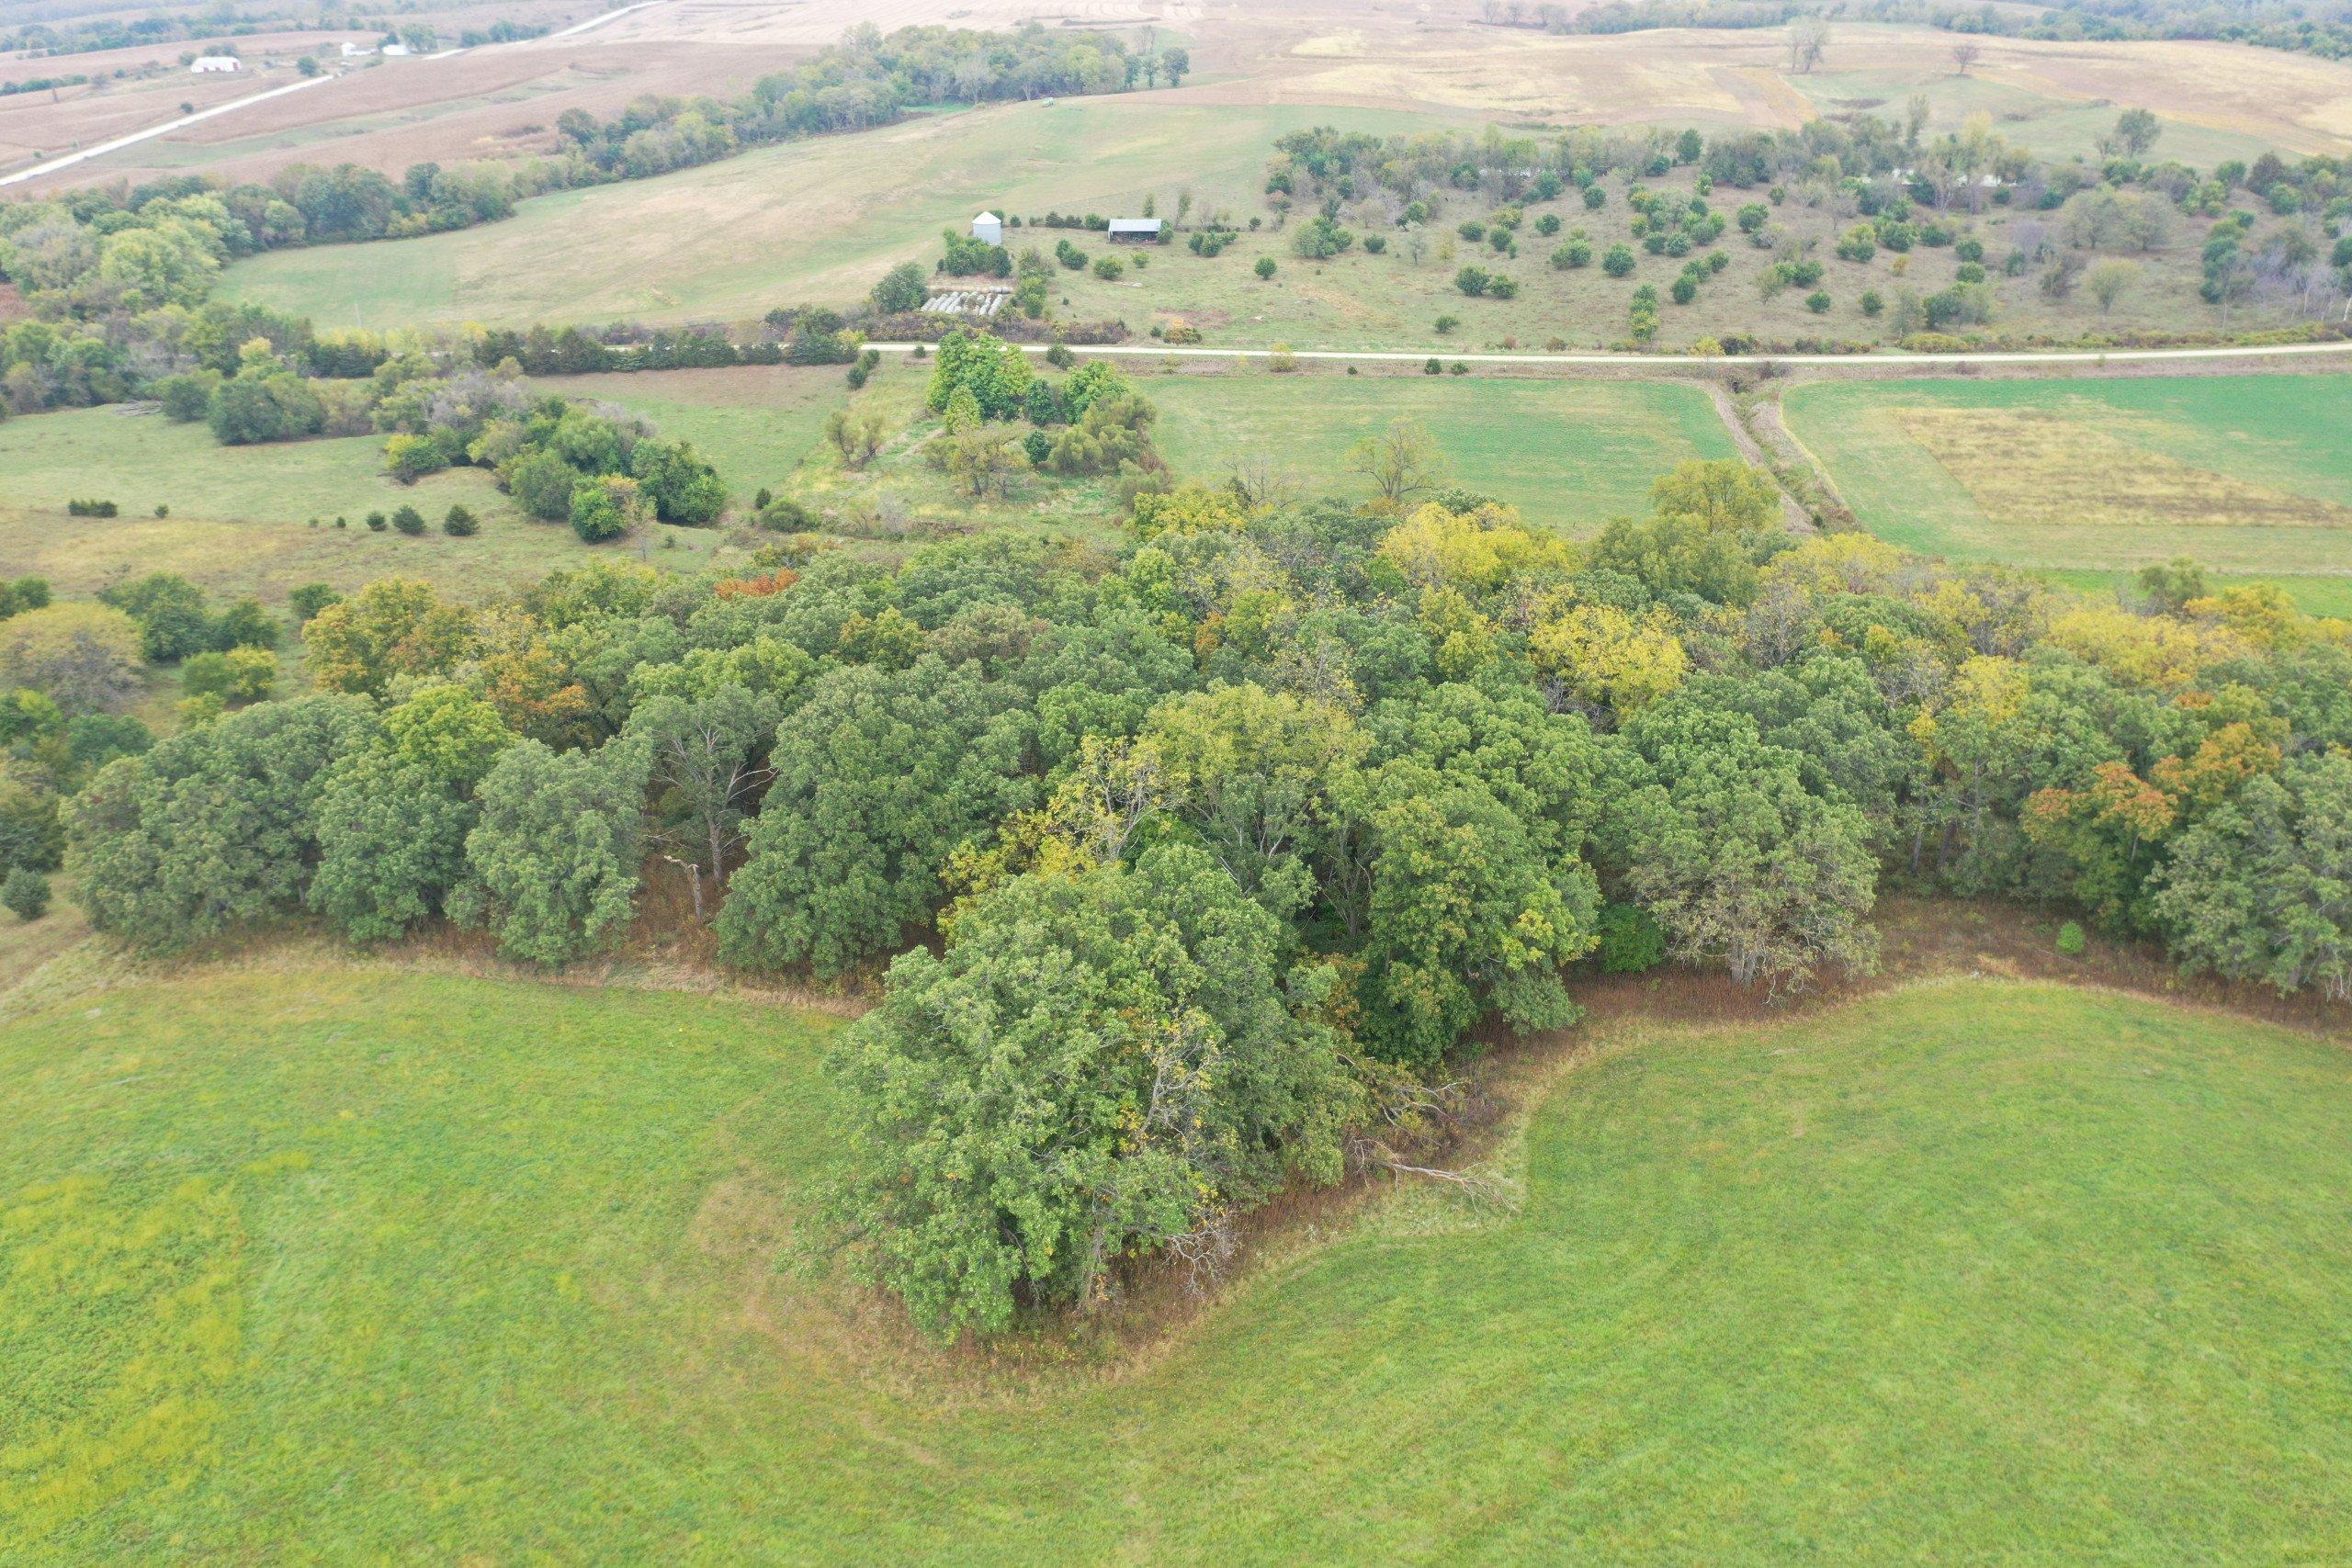 land-warren-county-iowa-200-acres-listing-number-15810-DJI_0615-6.jpg